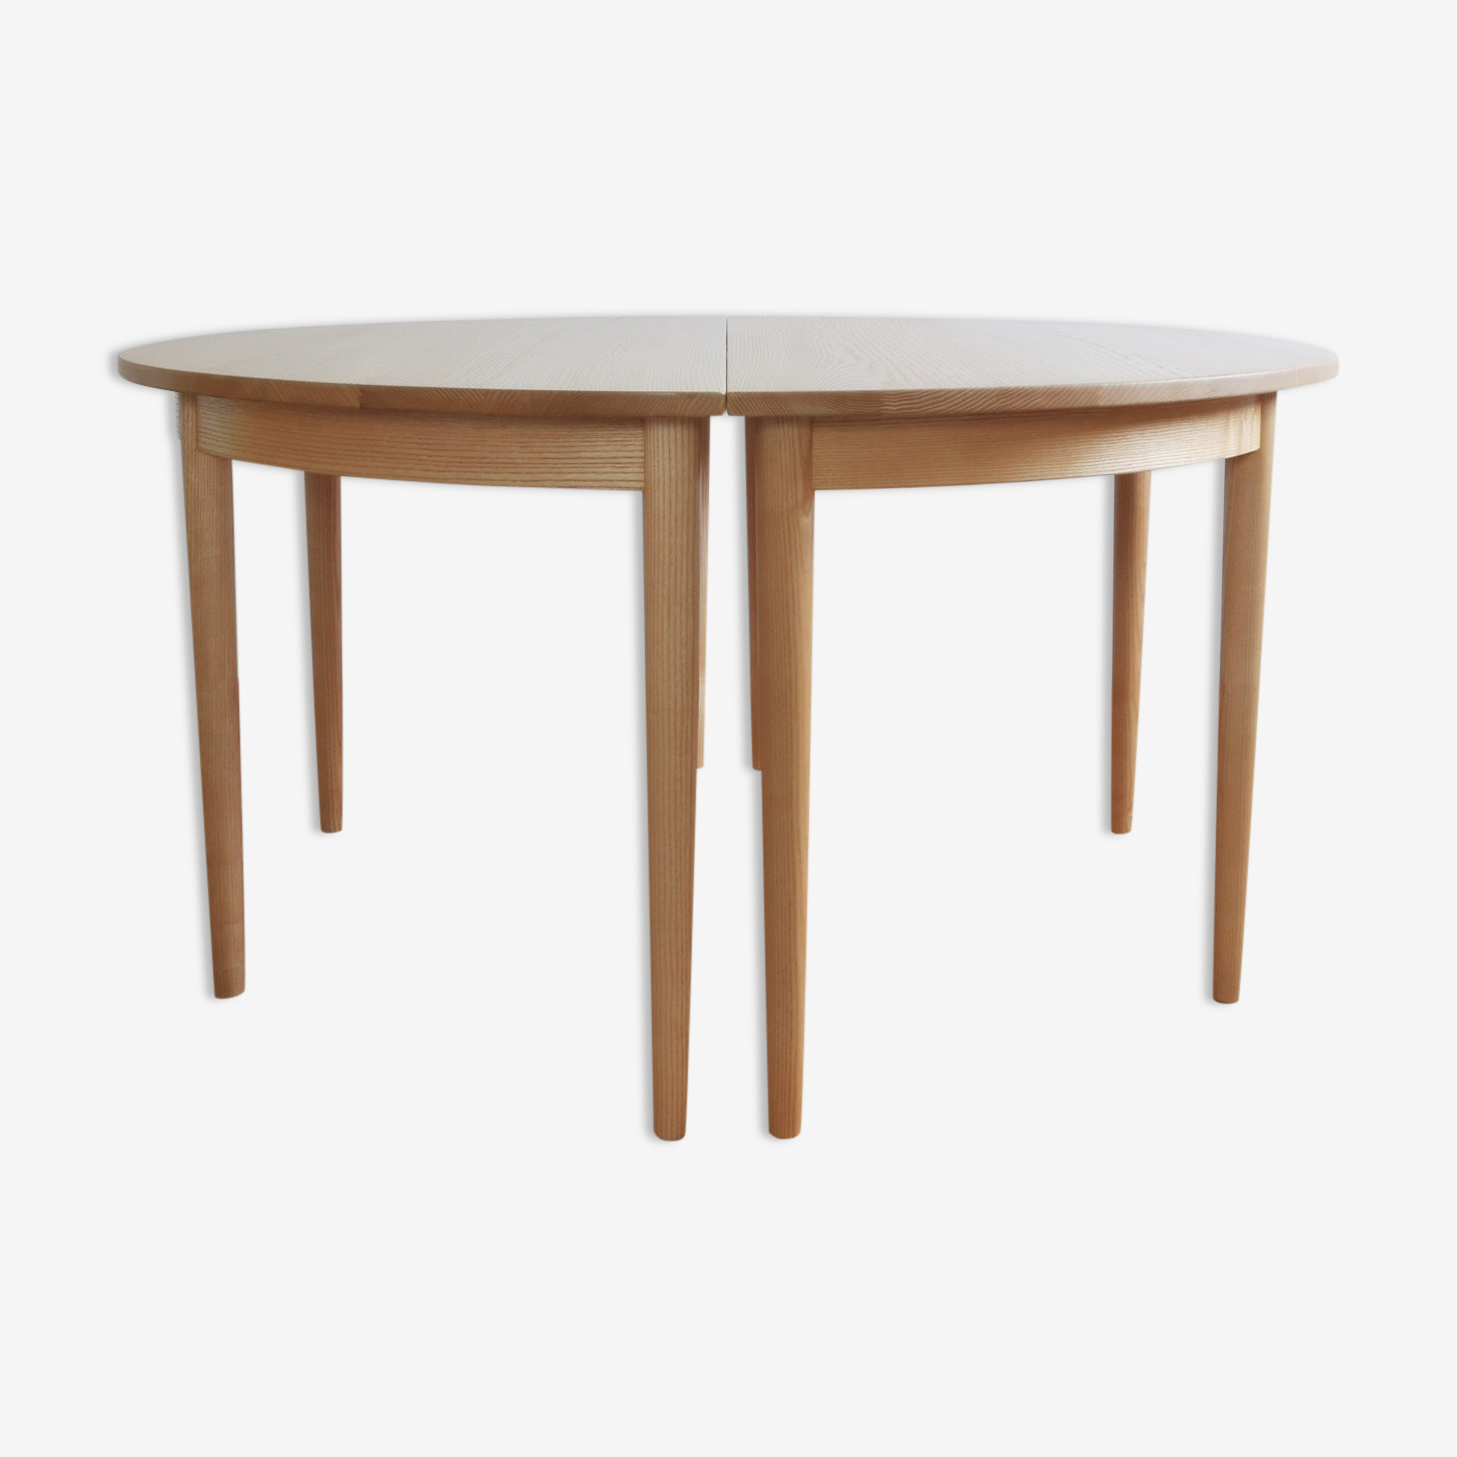 Danish round, double table by H.J. Wegner for PP Møbler, 1970